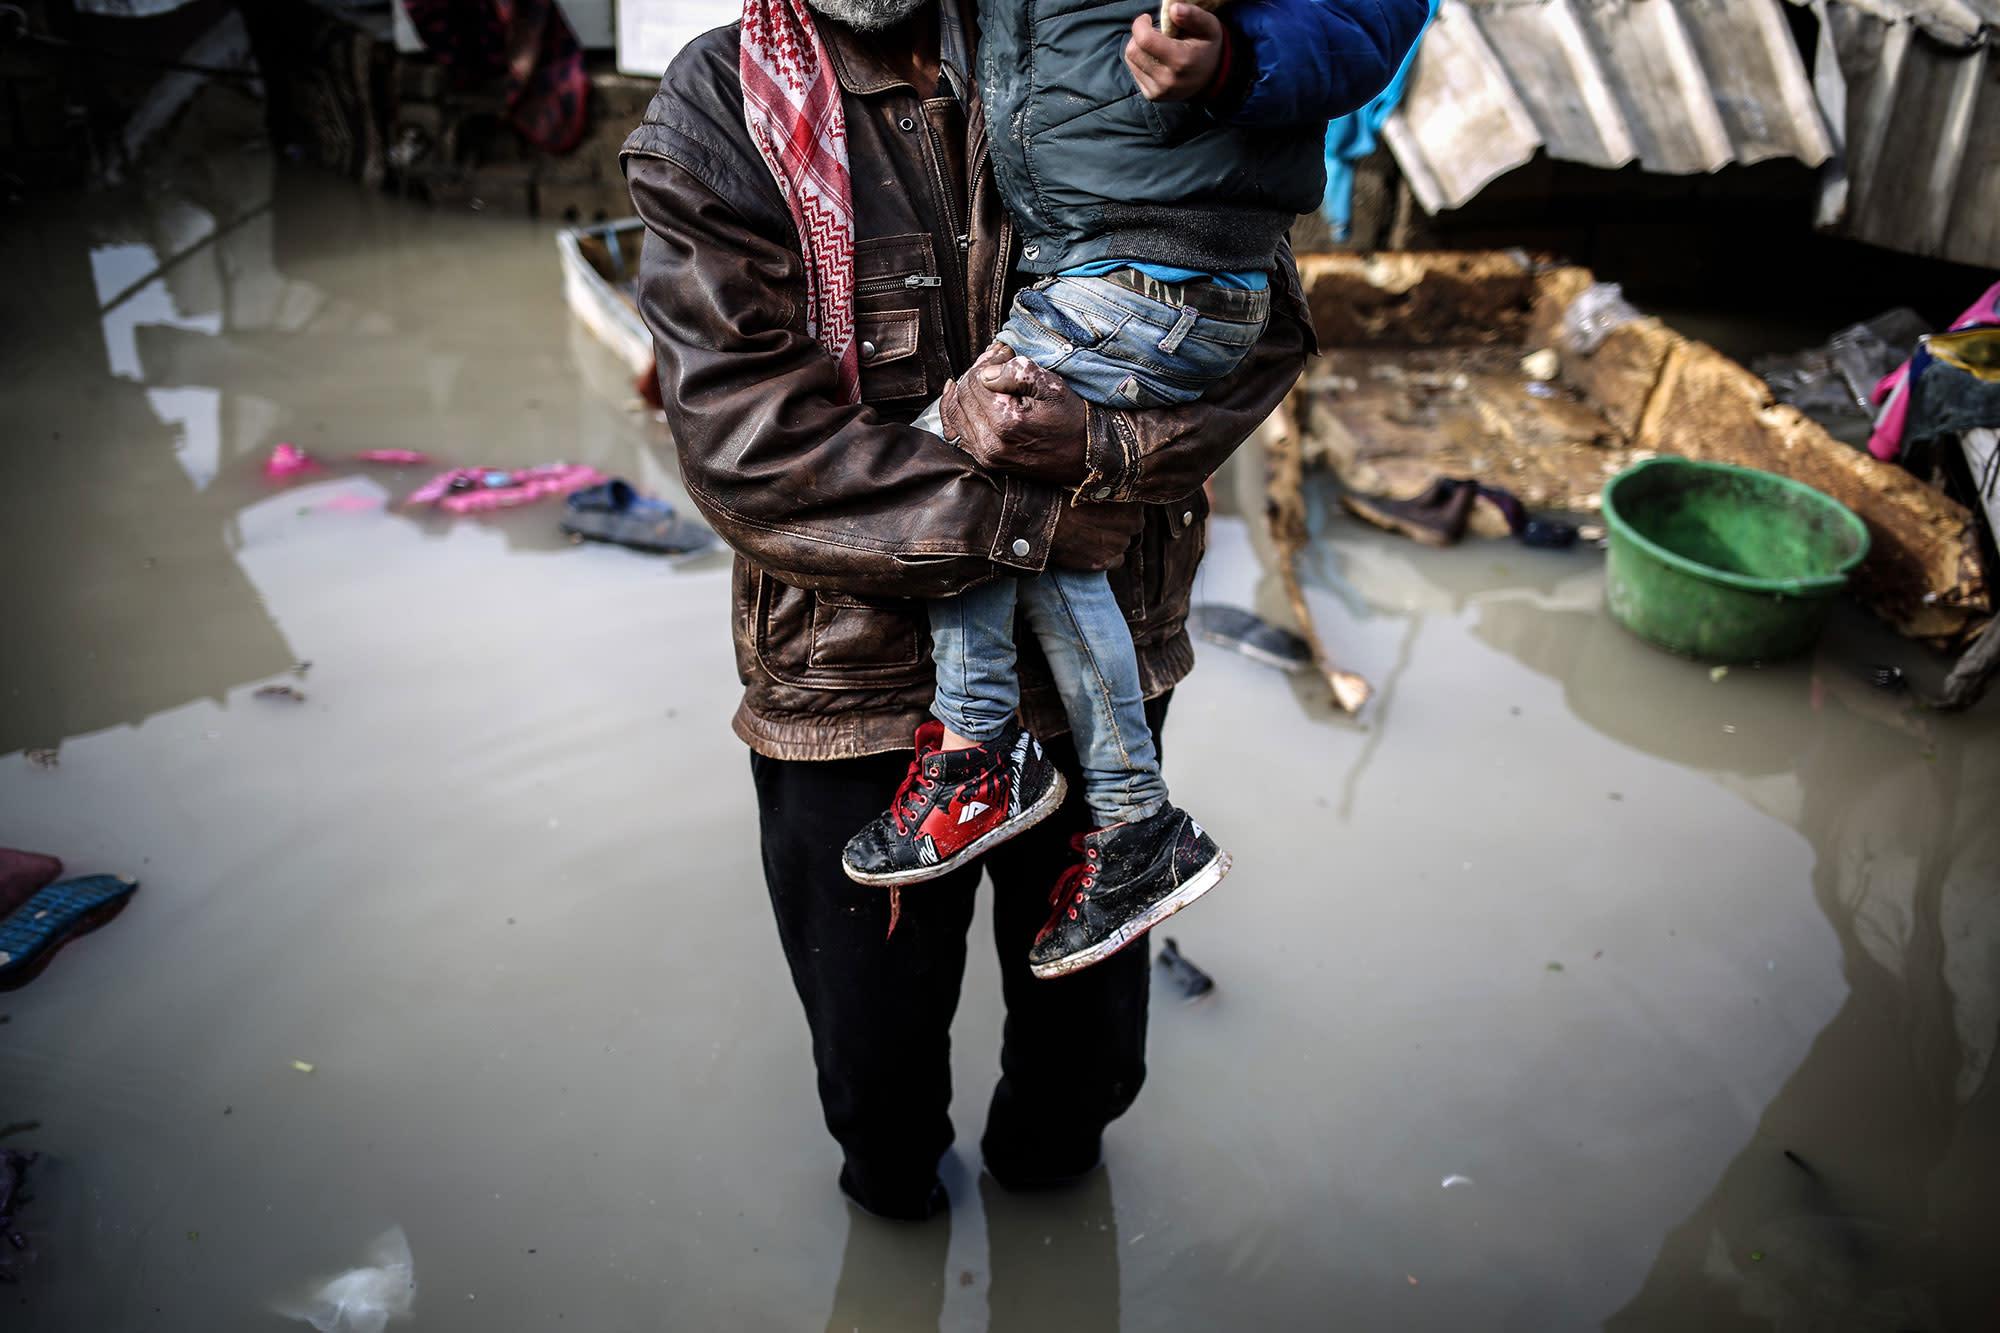 <p>A man with a boy walks through floodwater after heavy rainfall hit Gaza district of al-Saftawi, Gaza on February 16, 2017. (Ali Jadallah/Anadolu Agency/Getty Images) </p>